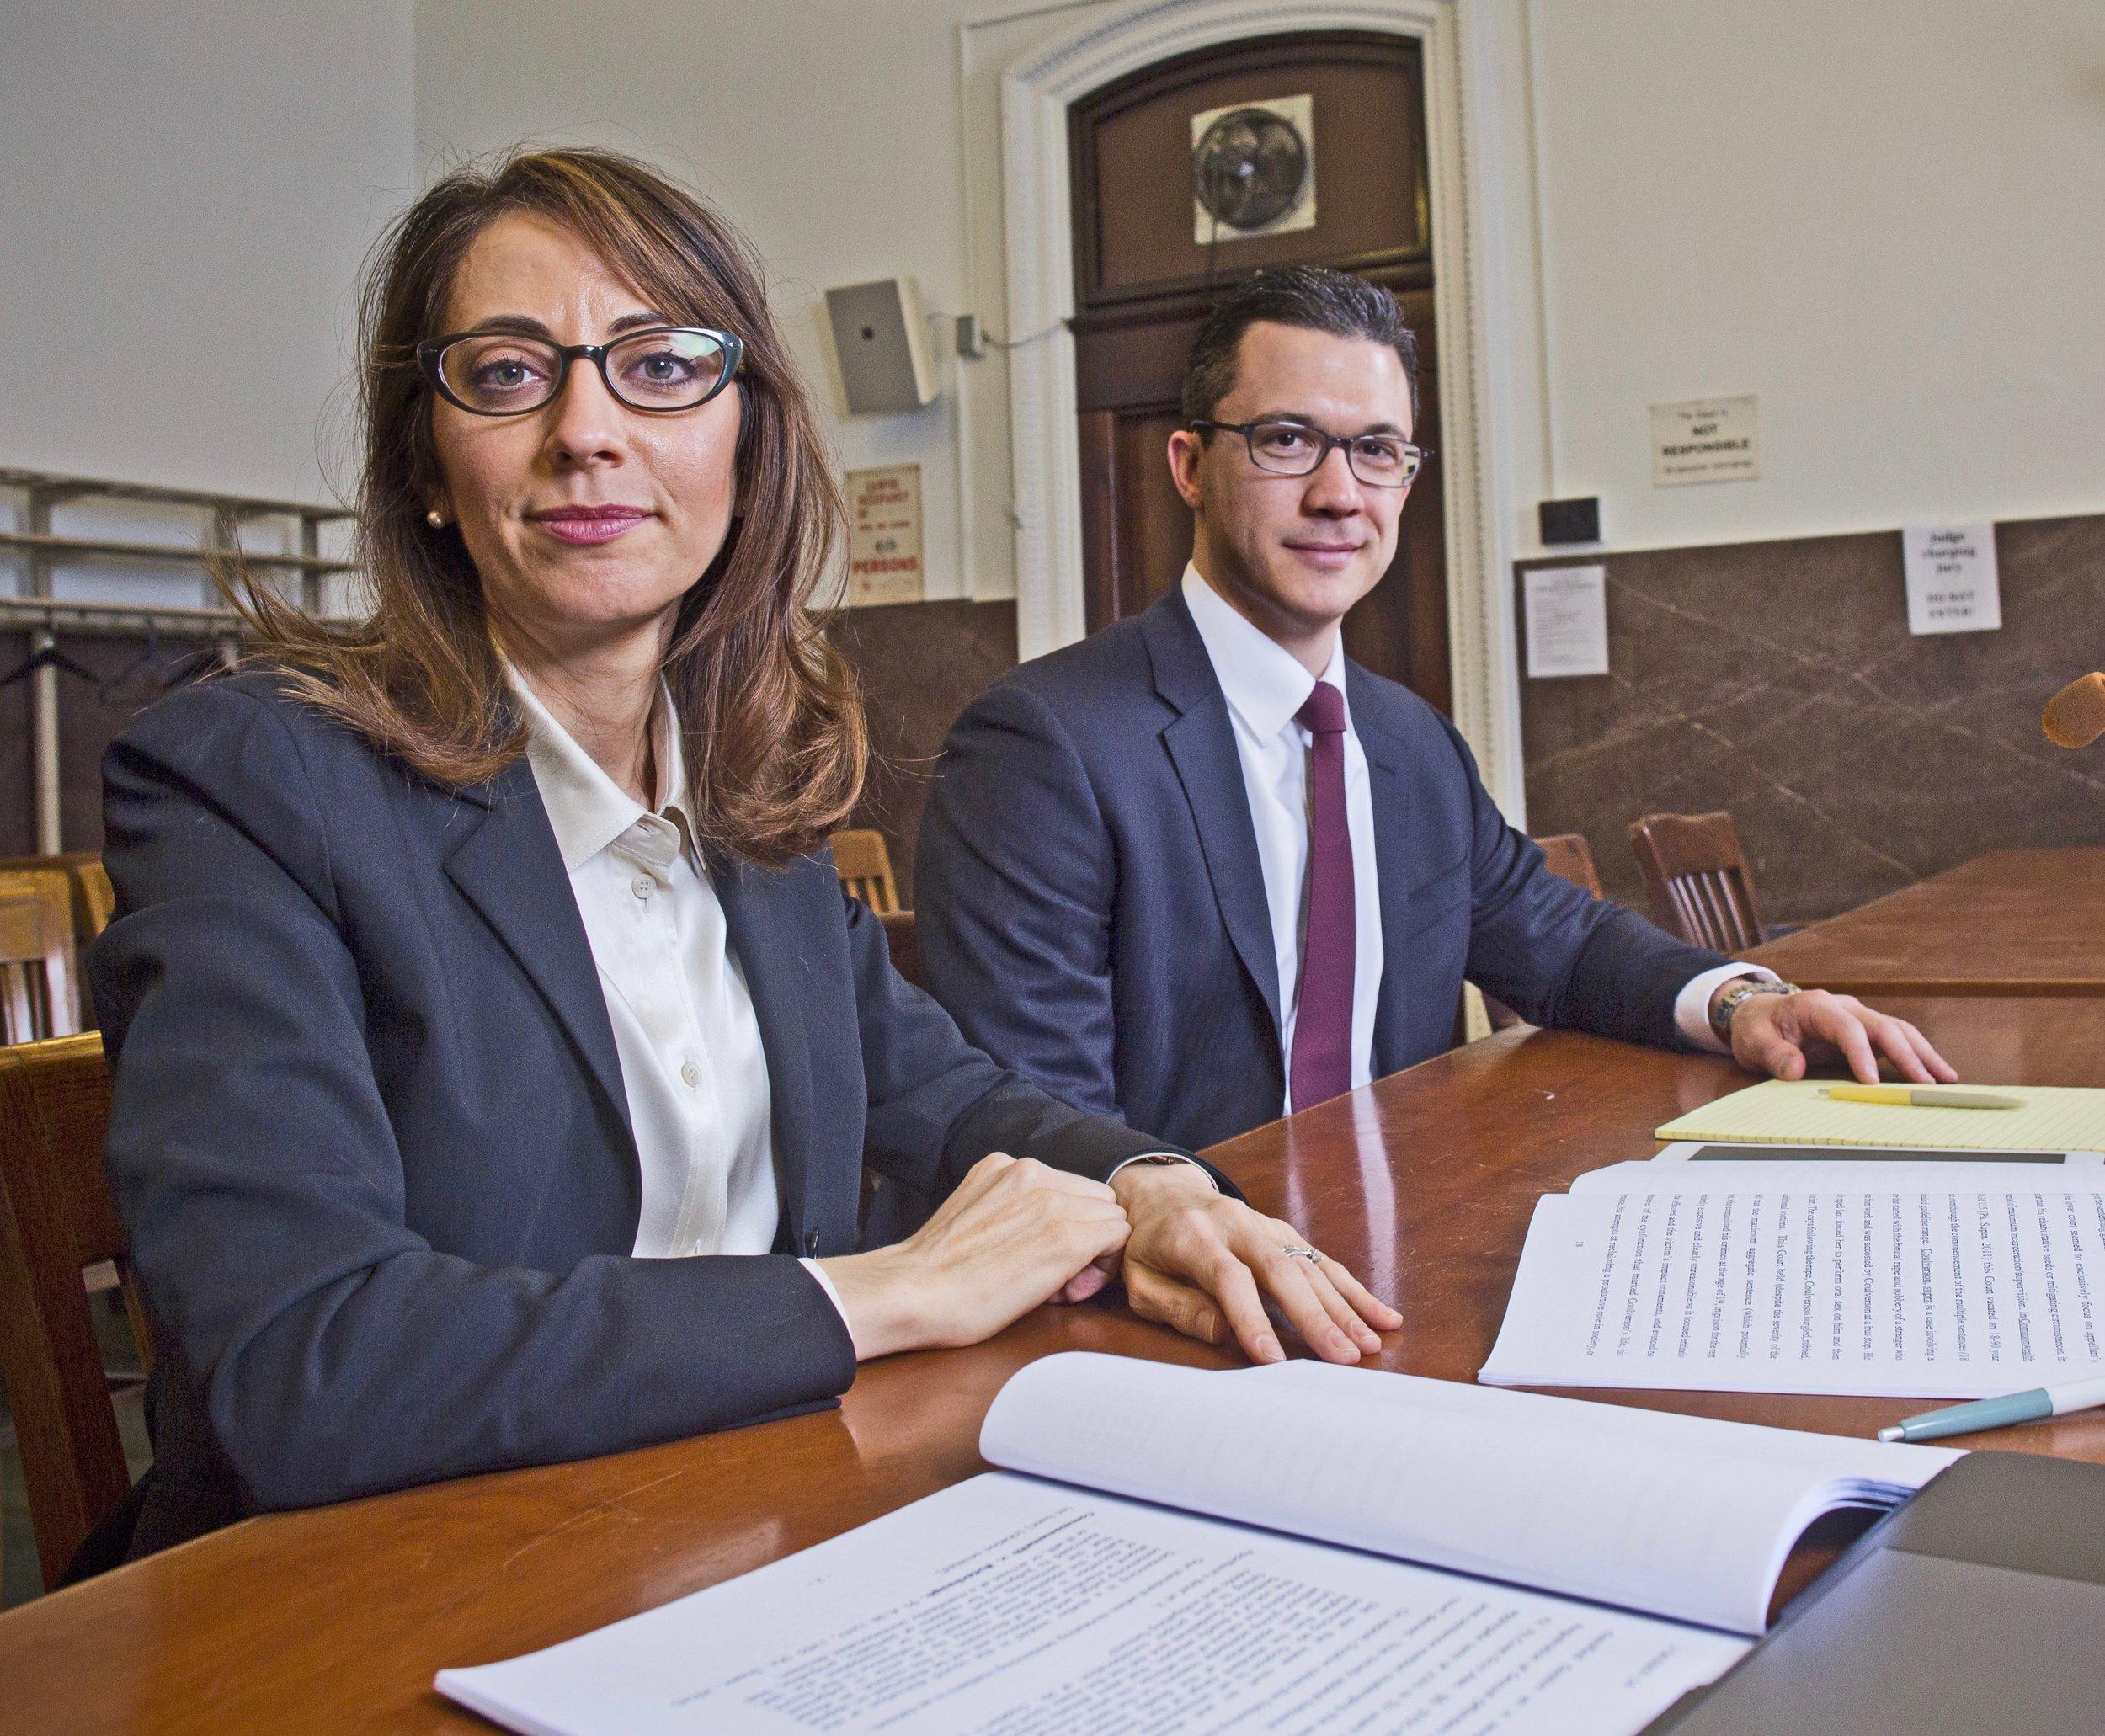 Demetra Mehta and Zak Goldstein - Philadelphia Criminal Defense Attorneys